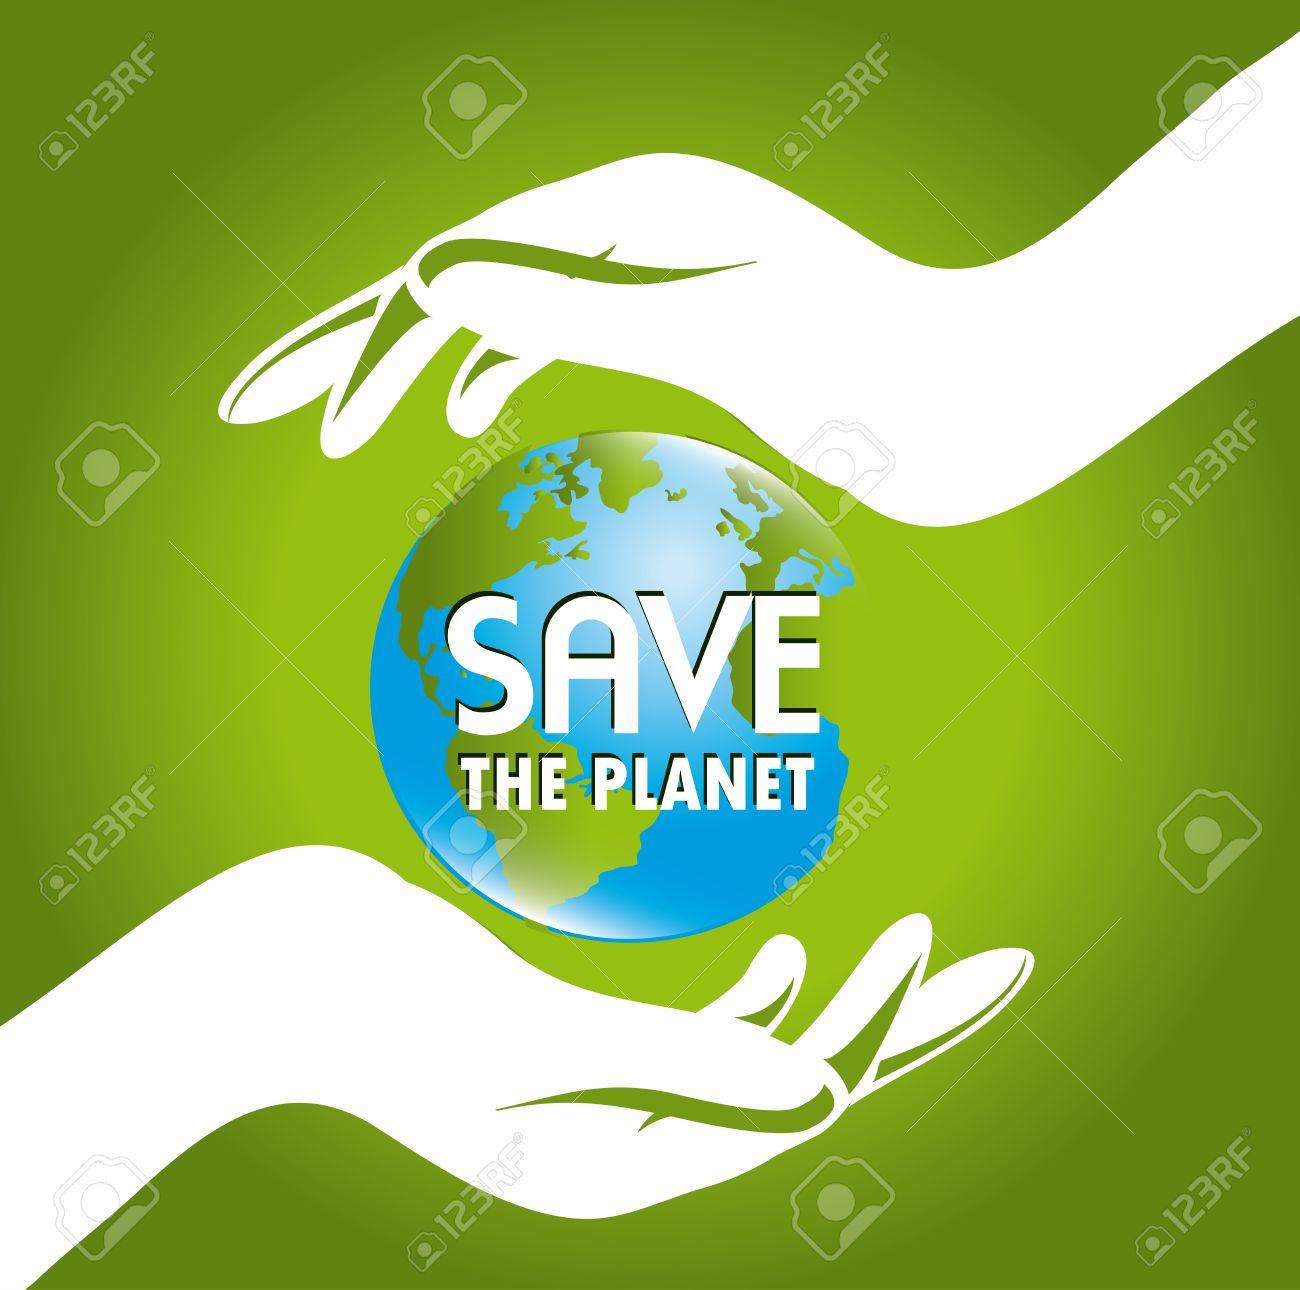 Poster design on save earth - Ecological Poster Save The Earth Design Over Green Background Vector Illustration Illustration